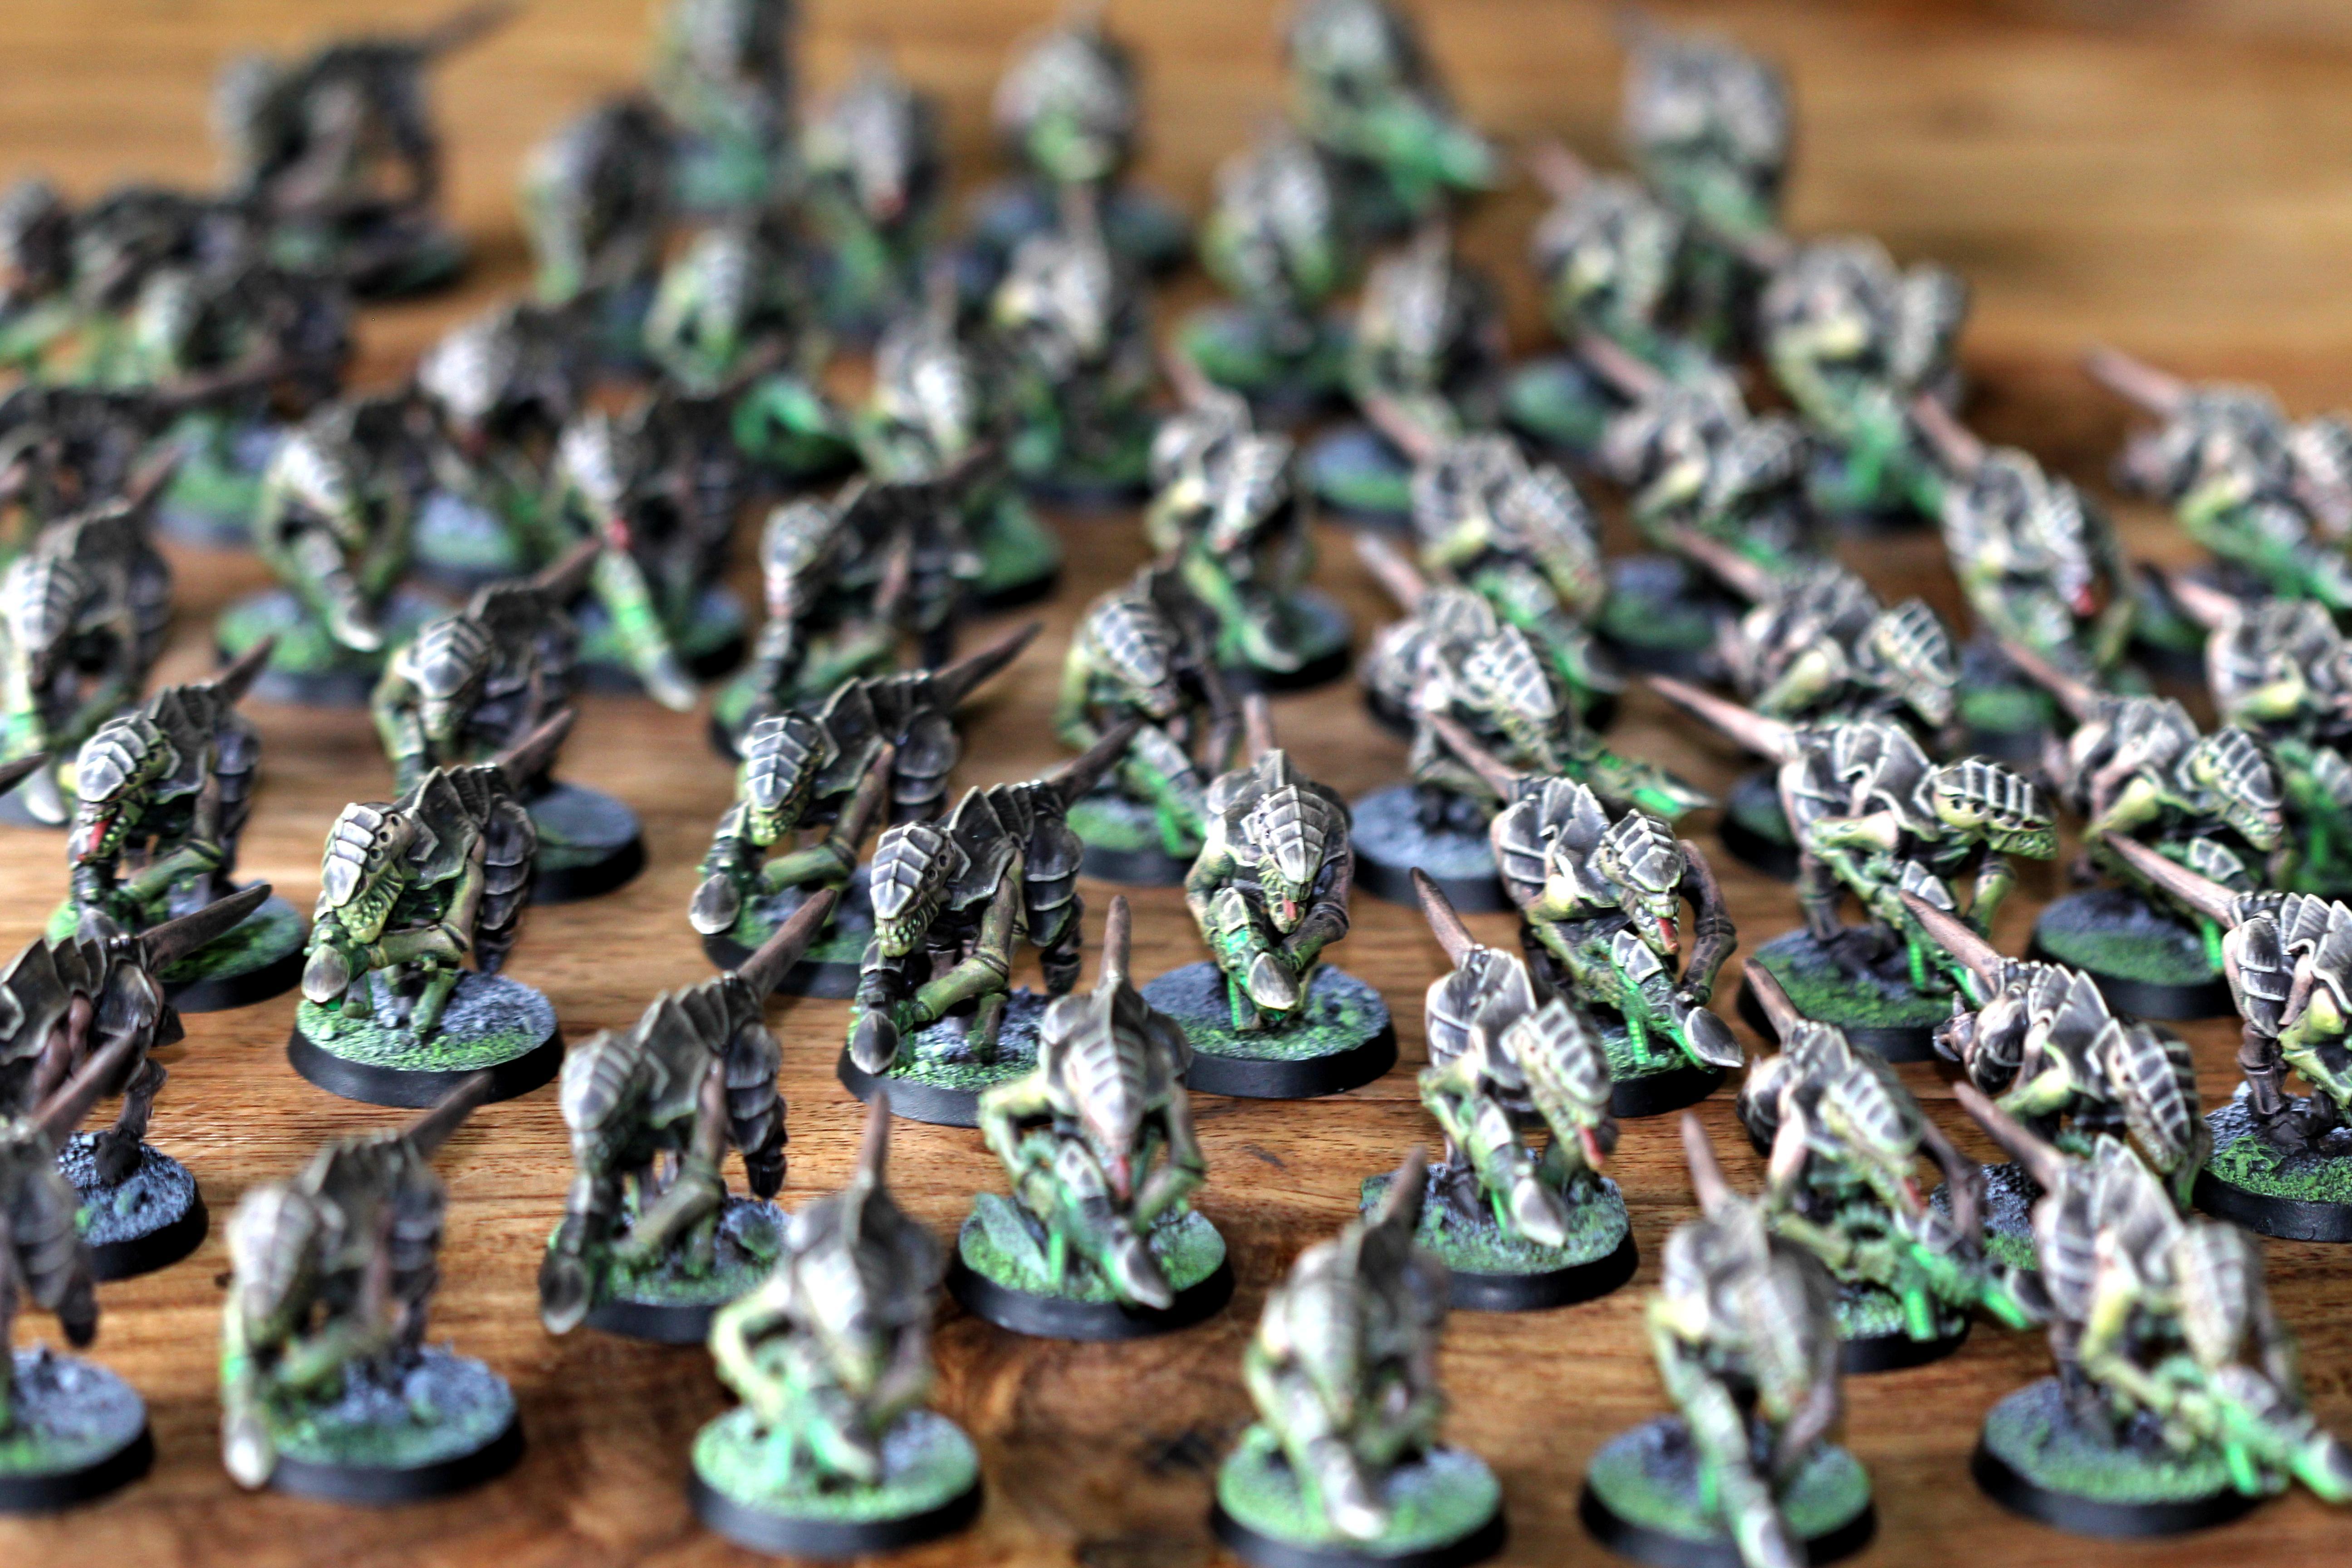 Gants, Swarm, Termagants, Troops, Tyranids, Warhammer 40,000